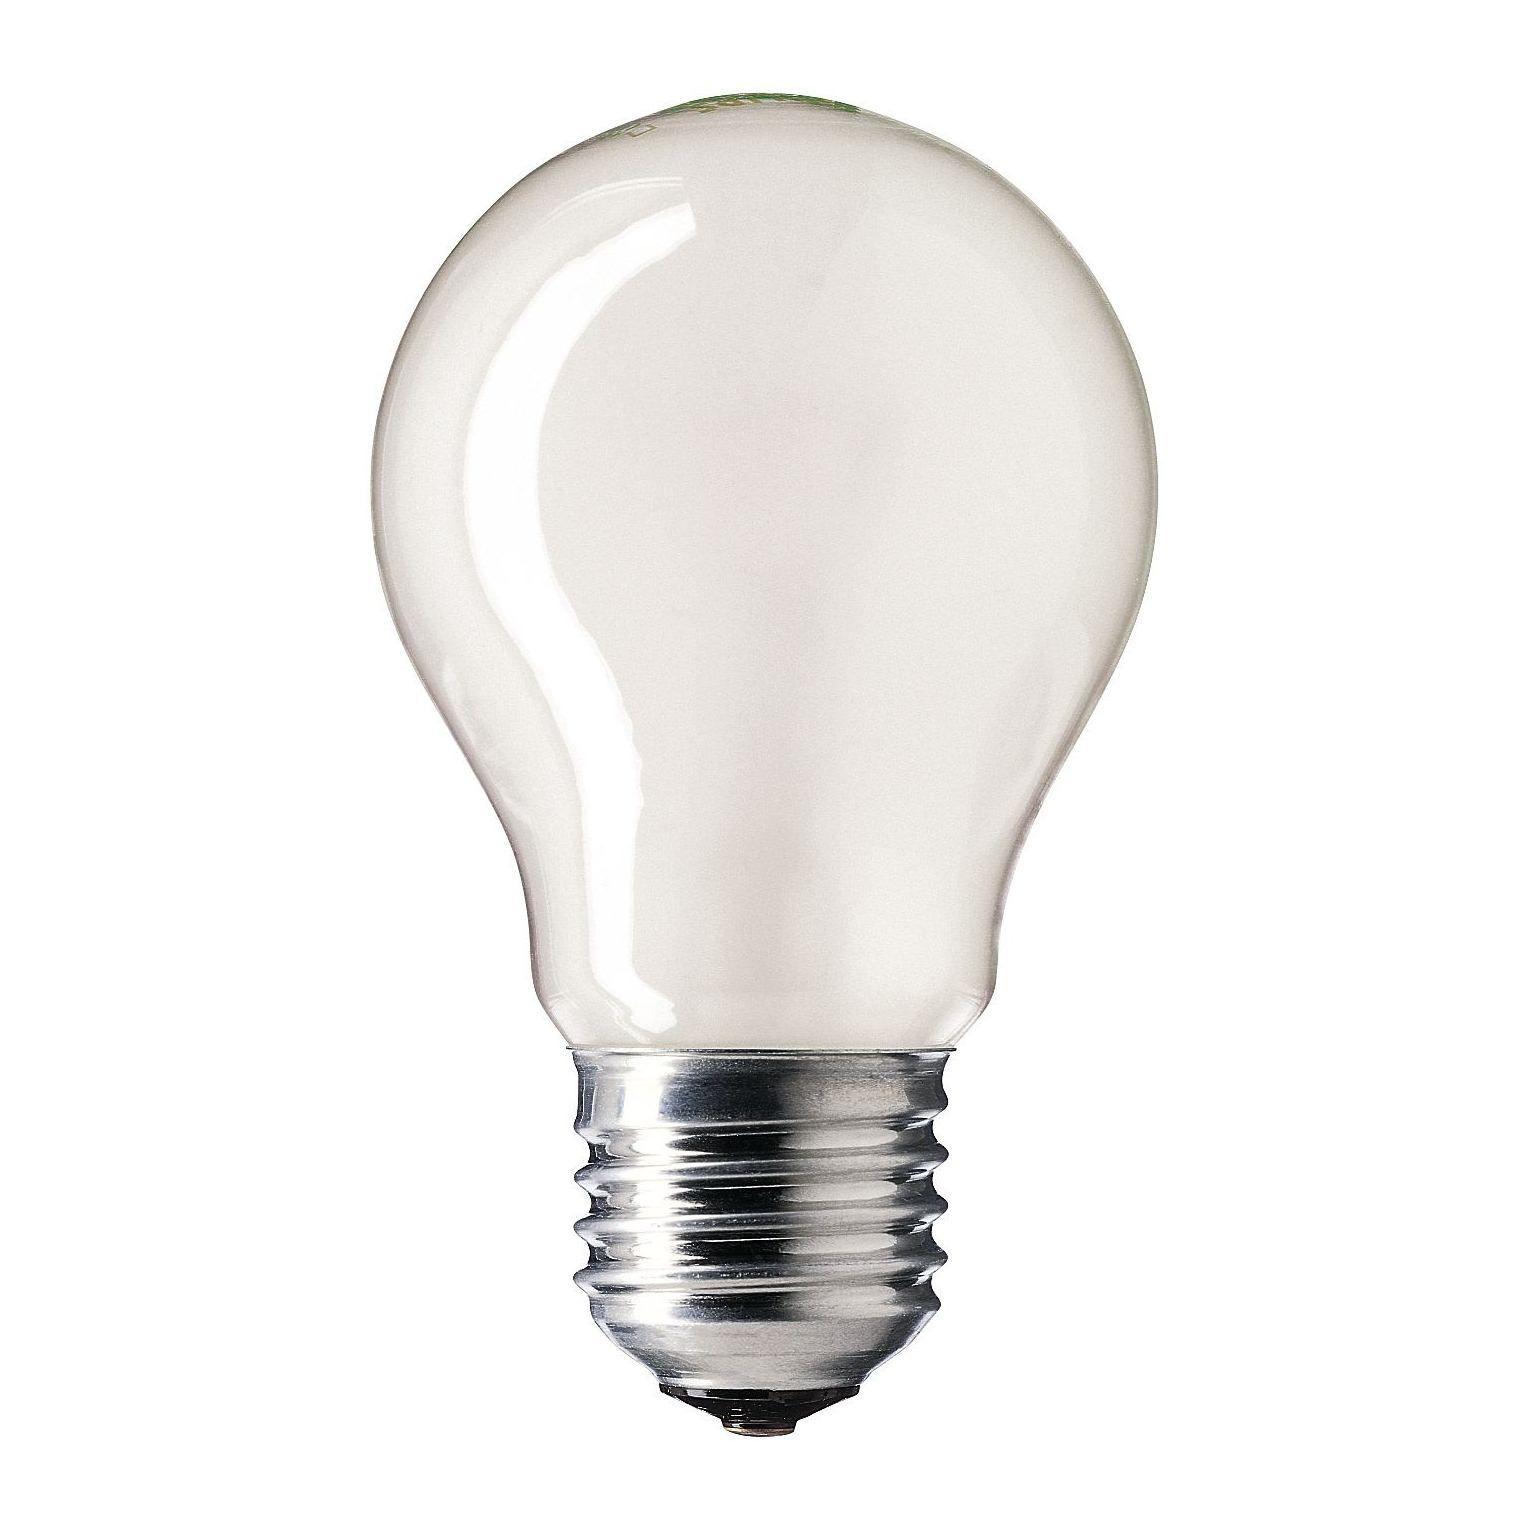 Купить Лампа накаливания Philips A55 40W 230V E27 FR.1CT/12X10F Pila матовая